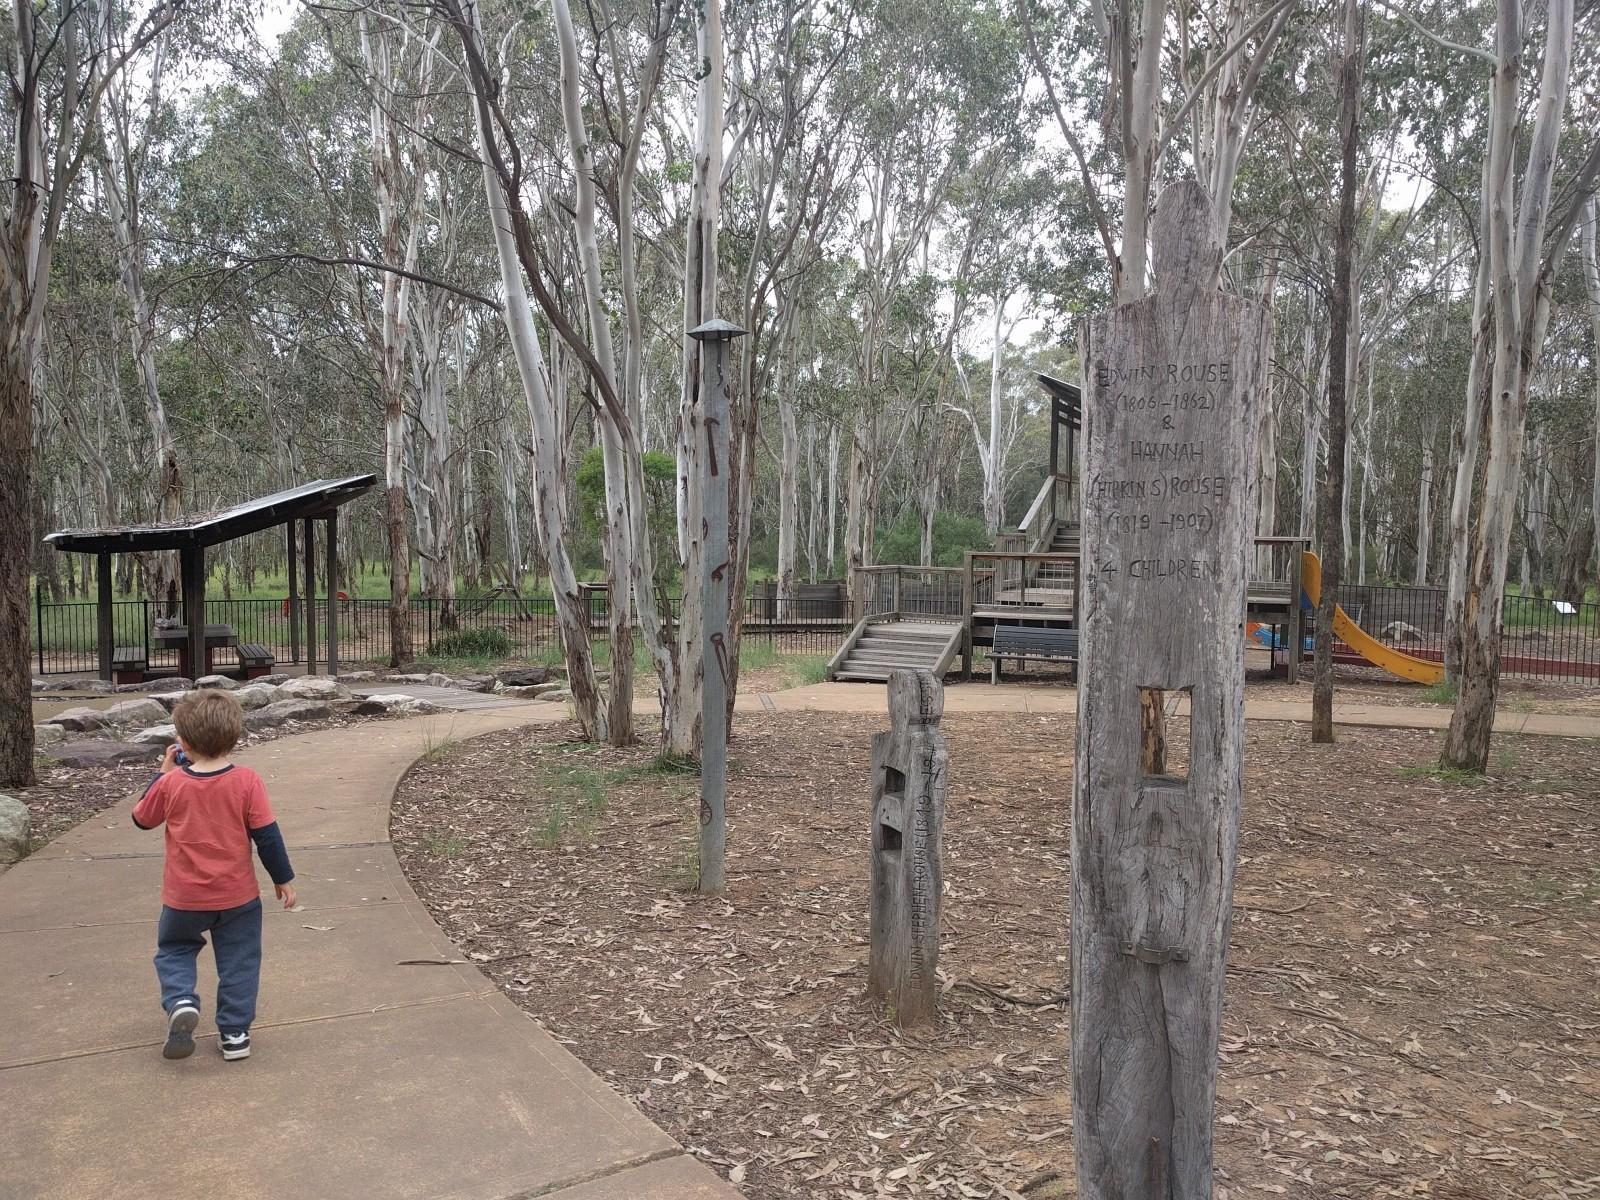 Rouse Hill Regional Park